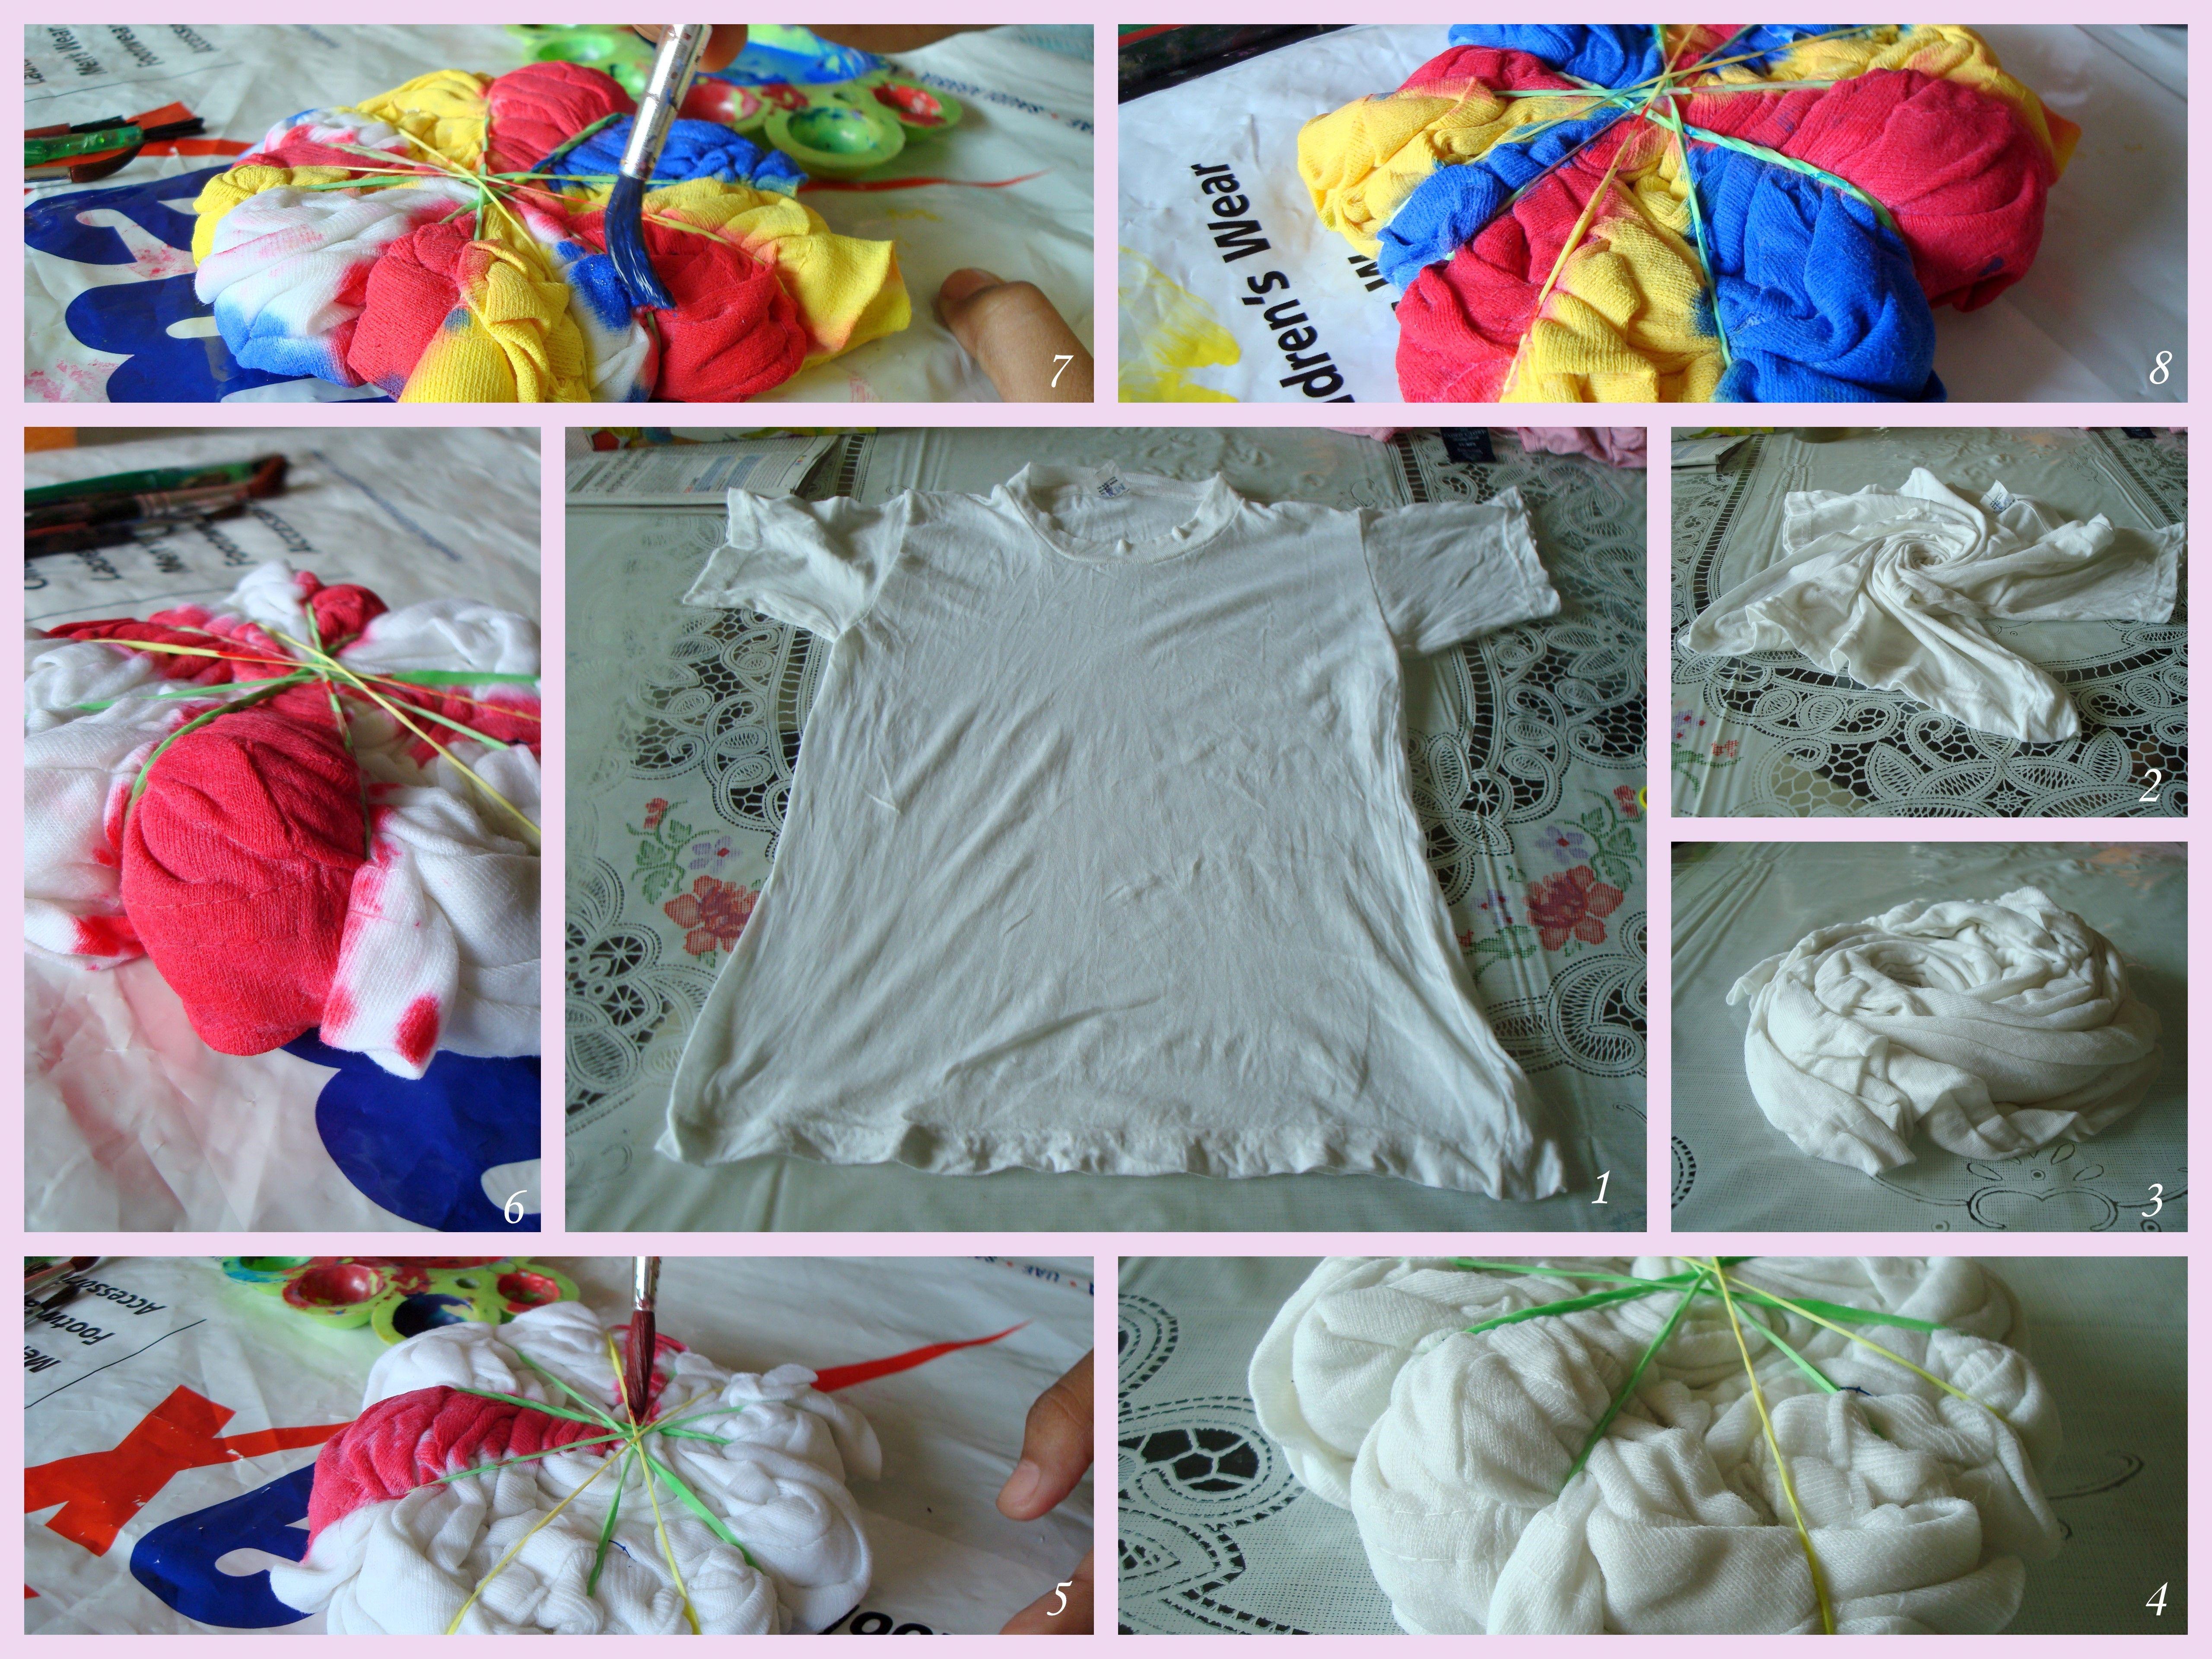 Tie n dye t shirt tutorial shirt tutorial acrylics and acrylic tie n dye t shirt baditri Gallery